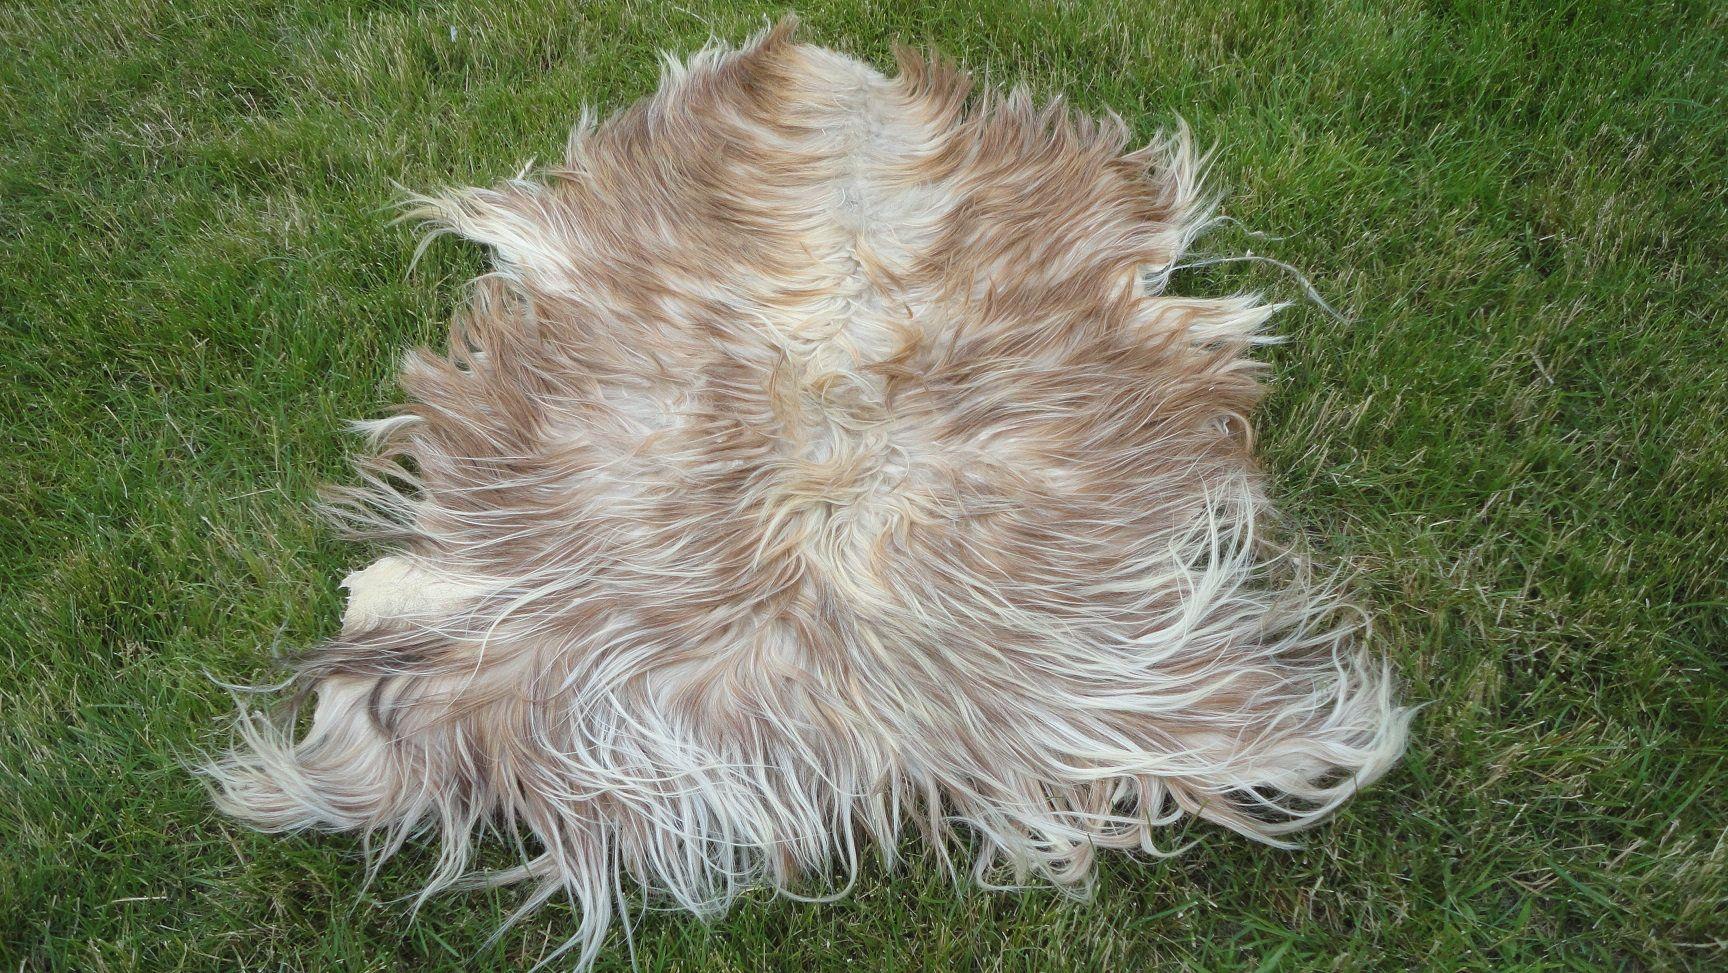 goat skin fur animal skin goat pelt real skin throw genuine skin hide leather carpet 4 3 x 3 7 ft fur rug long hair hide home decor